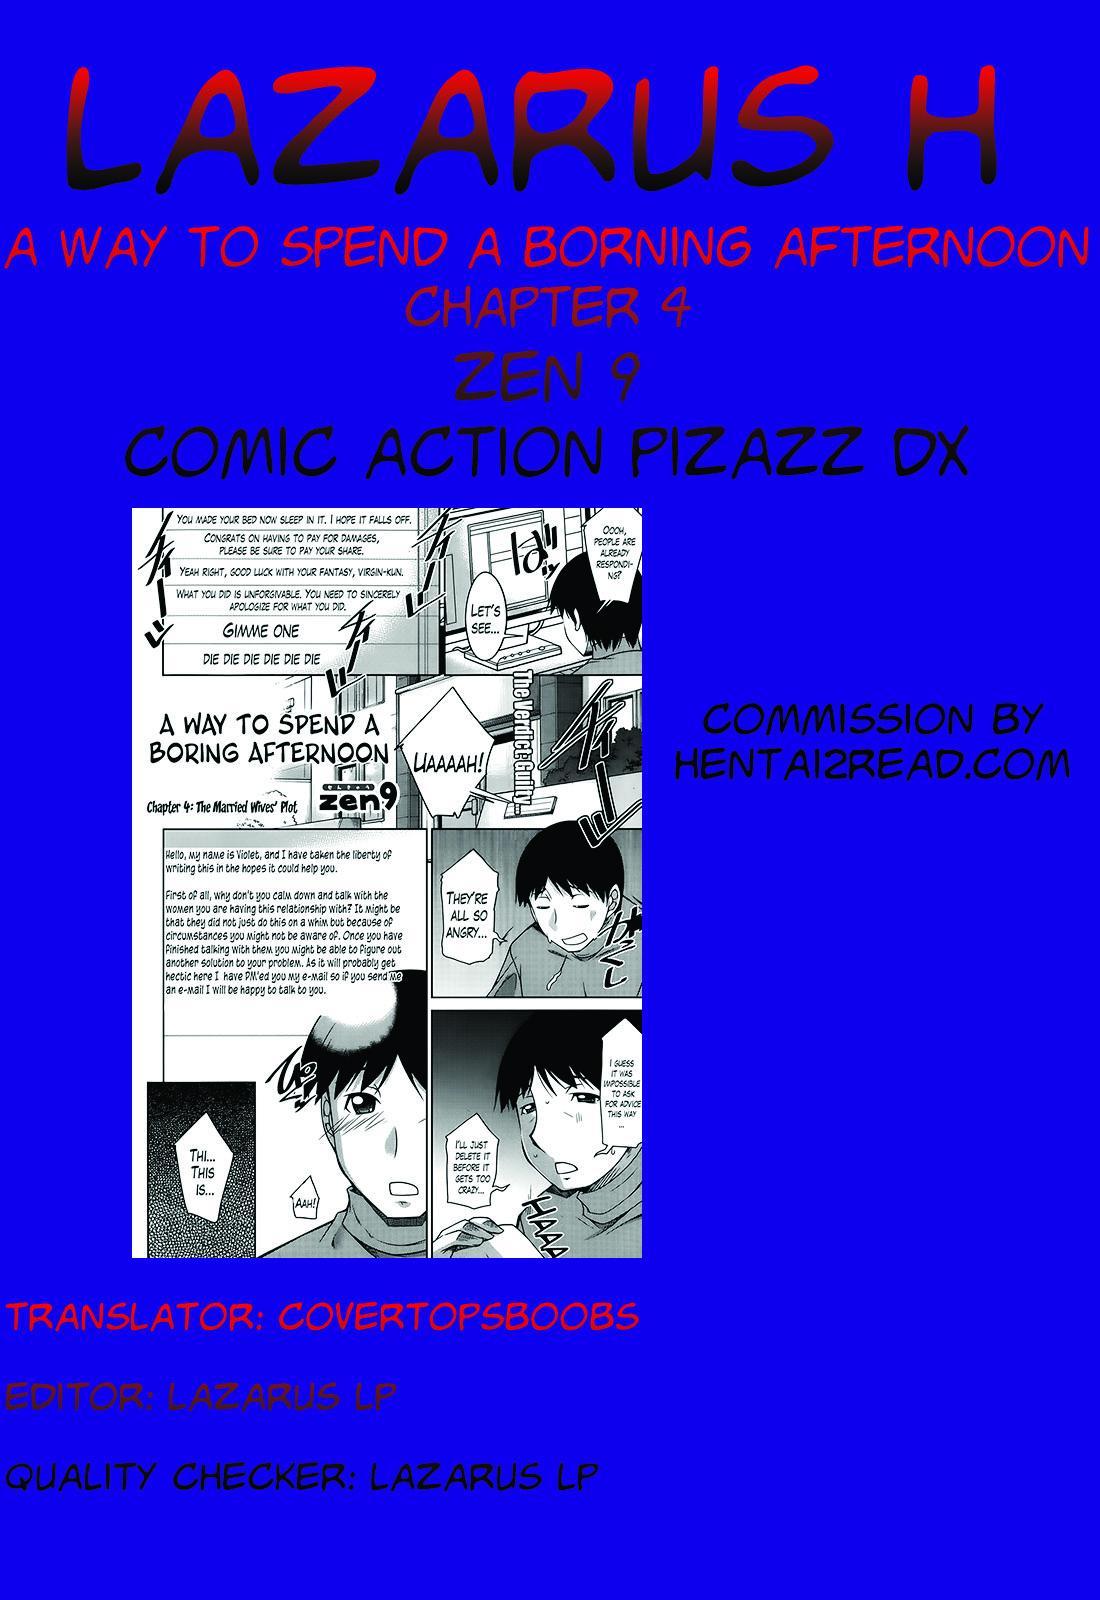 [Zen9] Taikutsu na Gogo no Sugoshikata Ch. 1-5   A Way to Spend a Boring Afternoon Ch. 1-5 (Action Pizazz DX 2013-12) [English](hentai2read.com)[Lazarus H] 76